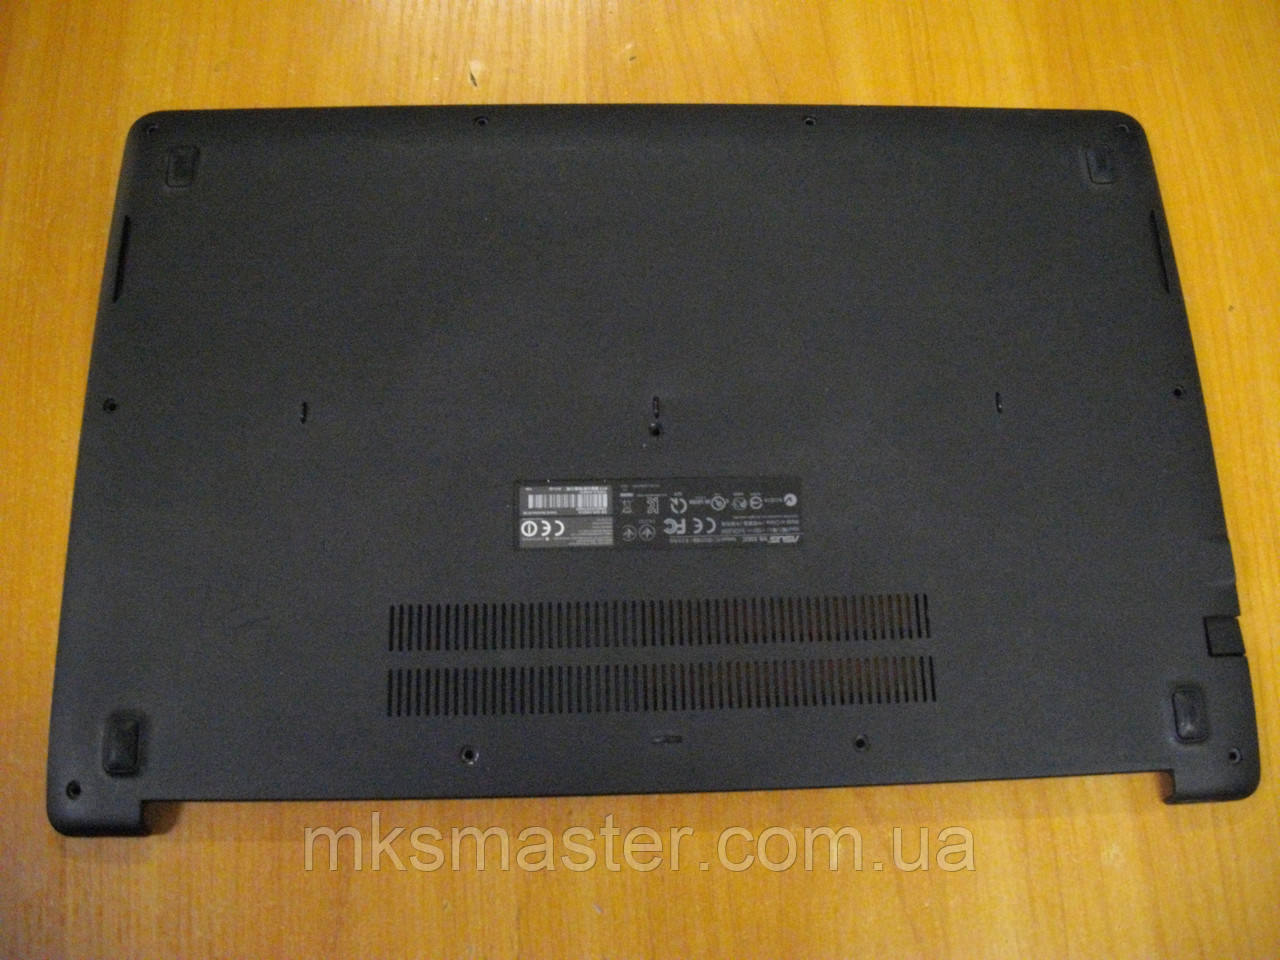 Корпус низ, Нижня частина корпусу ASUS X502C, БО 13NB00I1AP0411